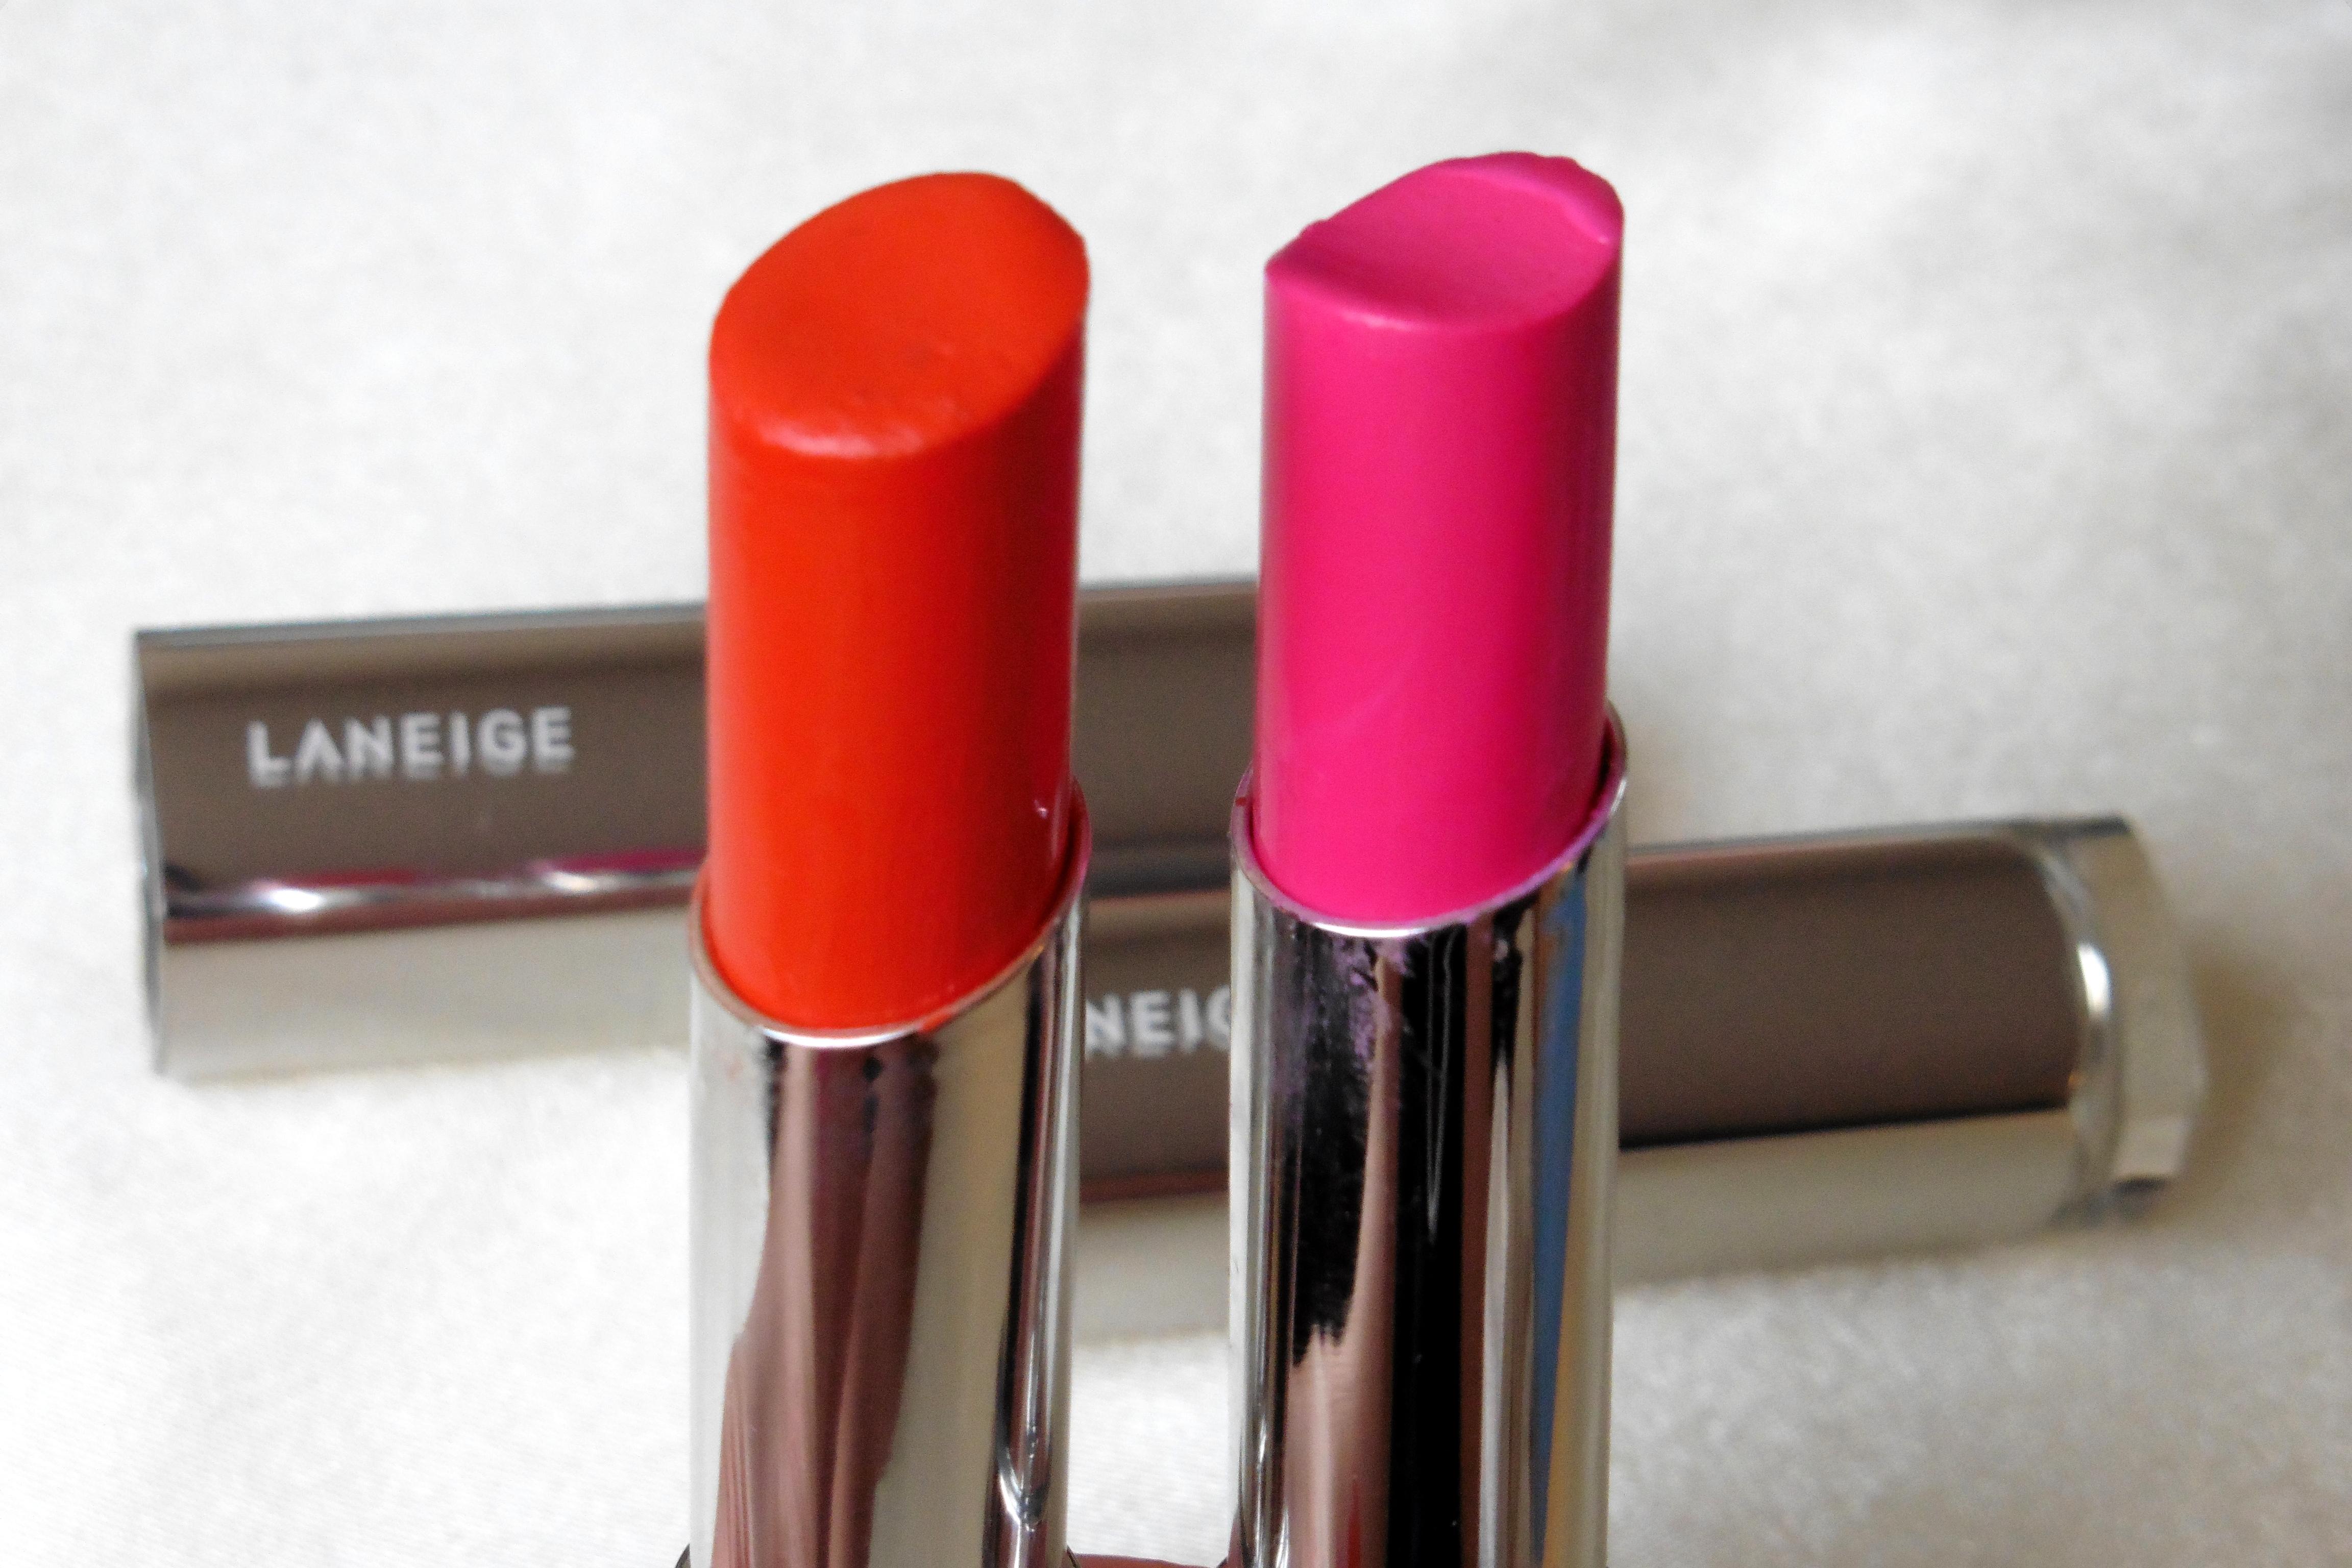 My Laneige Serum Intense Lipsticks from Another Star